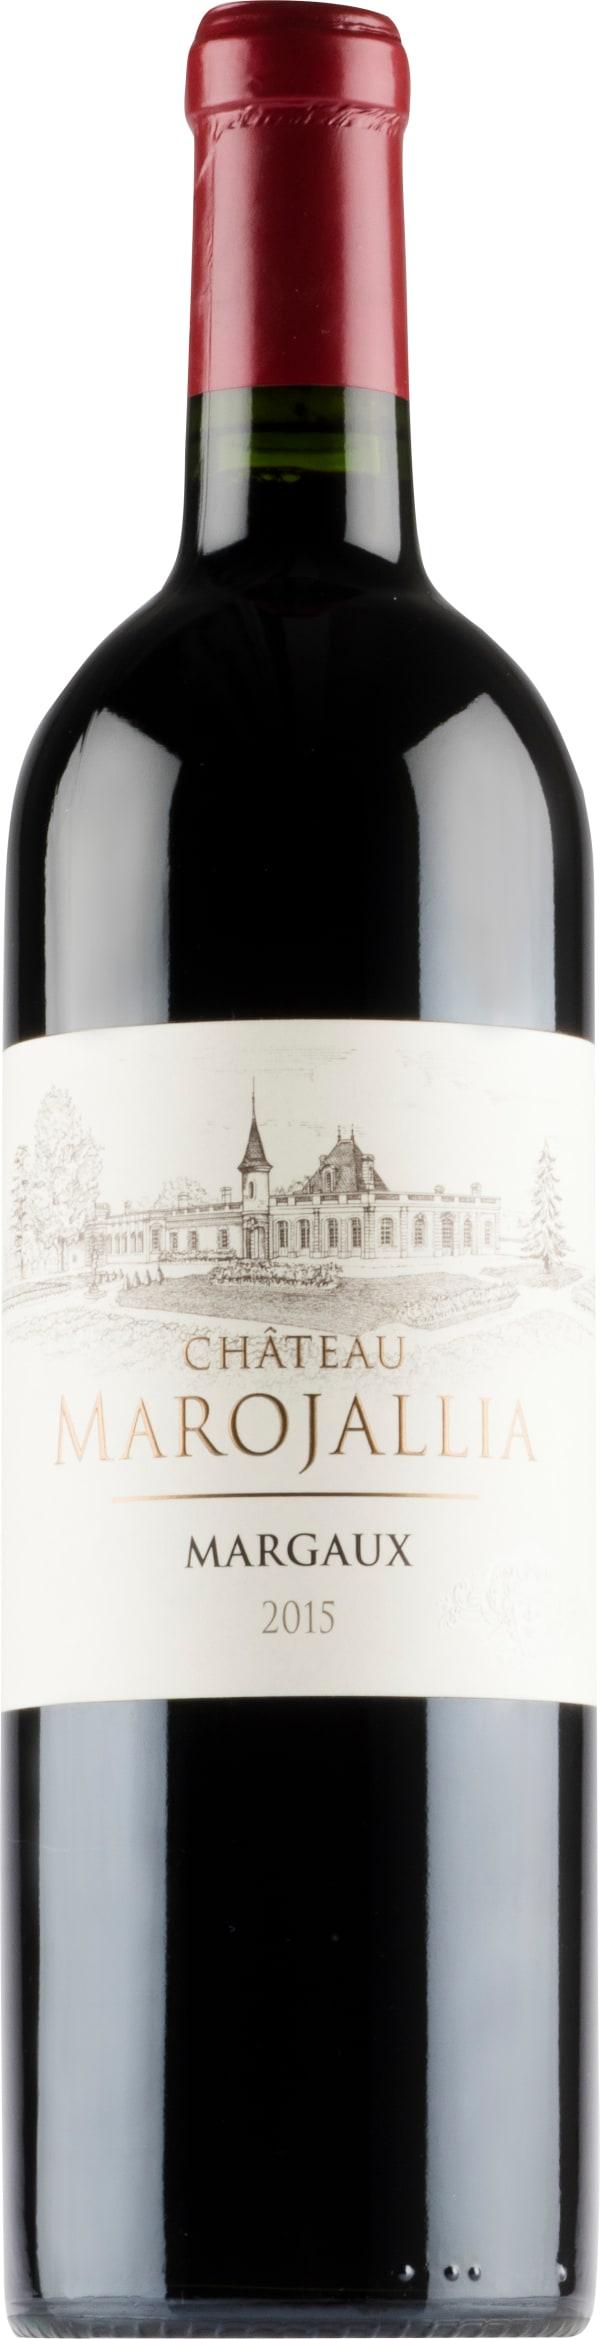 Château Marojallia 2015